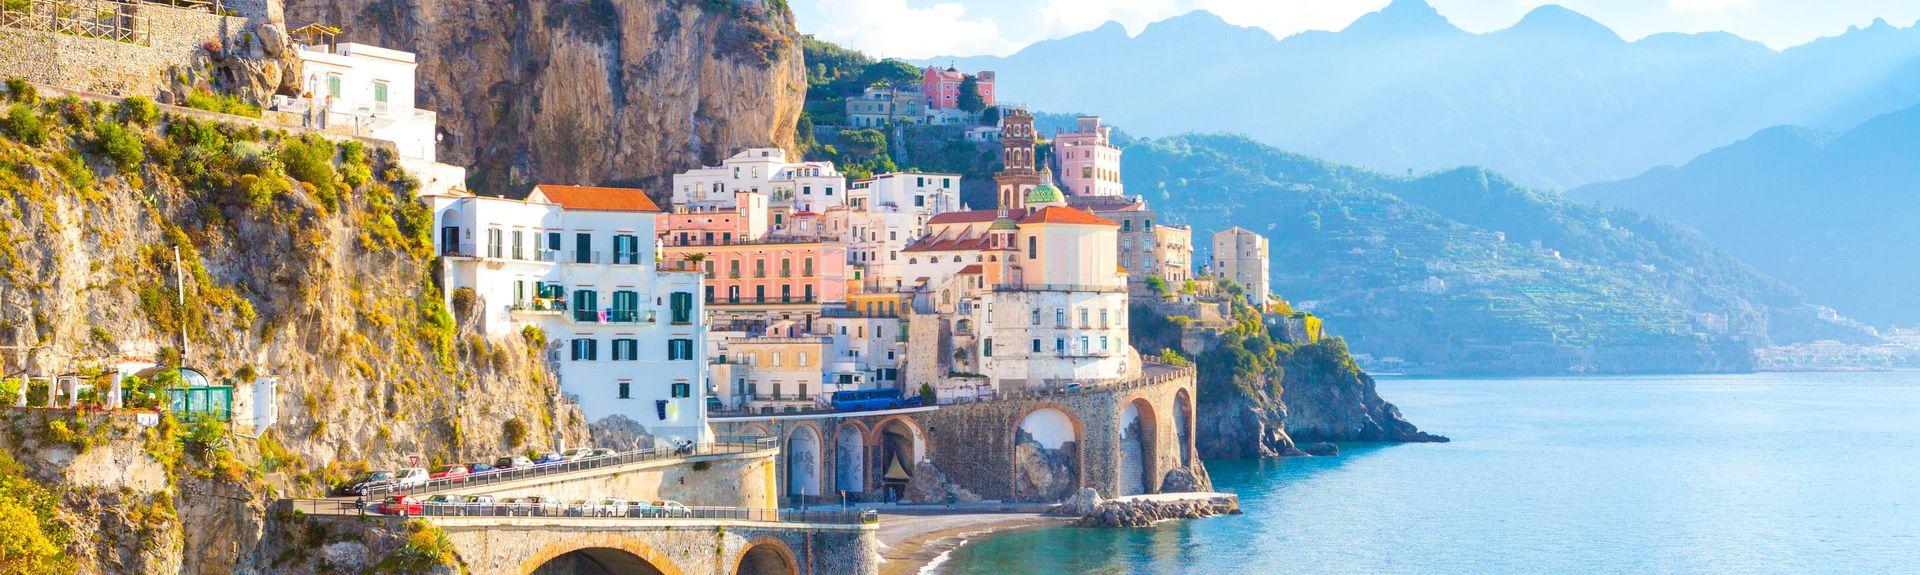 Massa di Somma, Metropolitan City of Naples, Campania, Italy